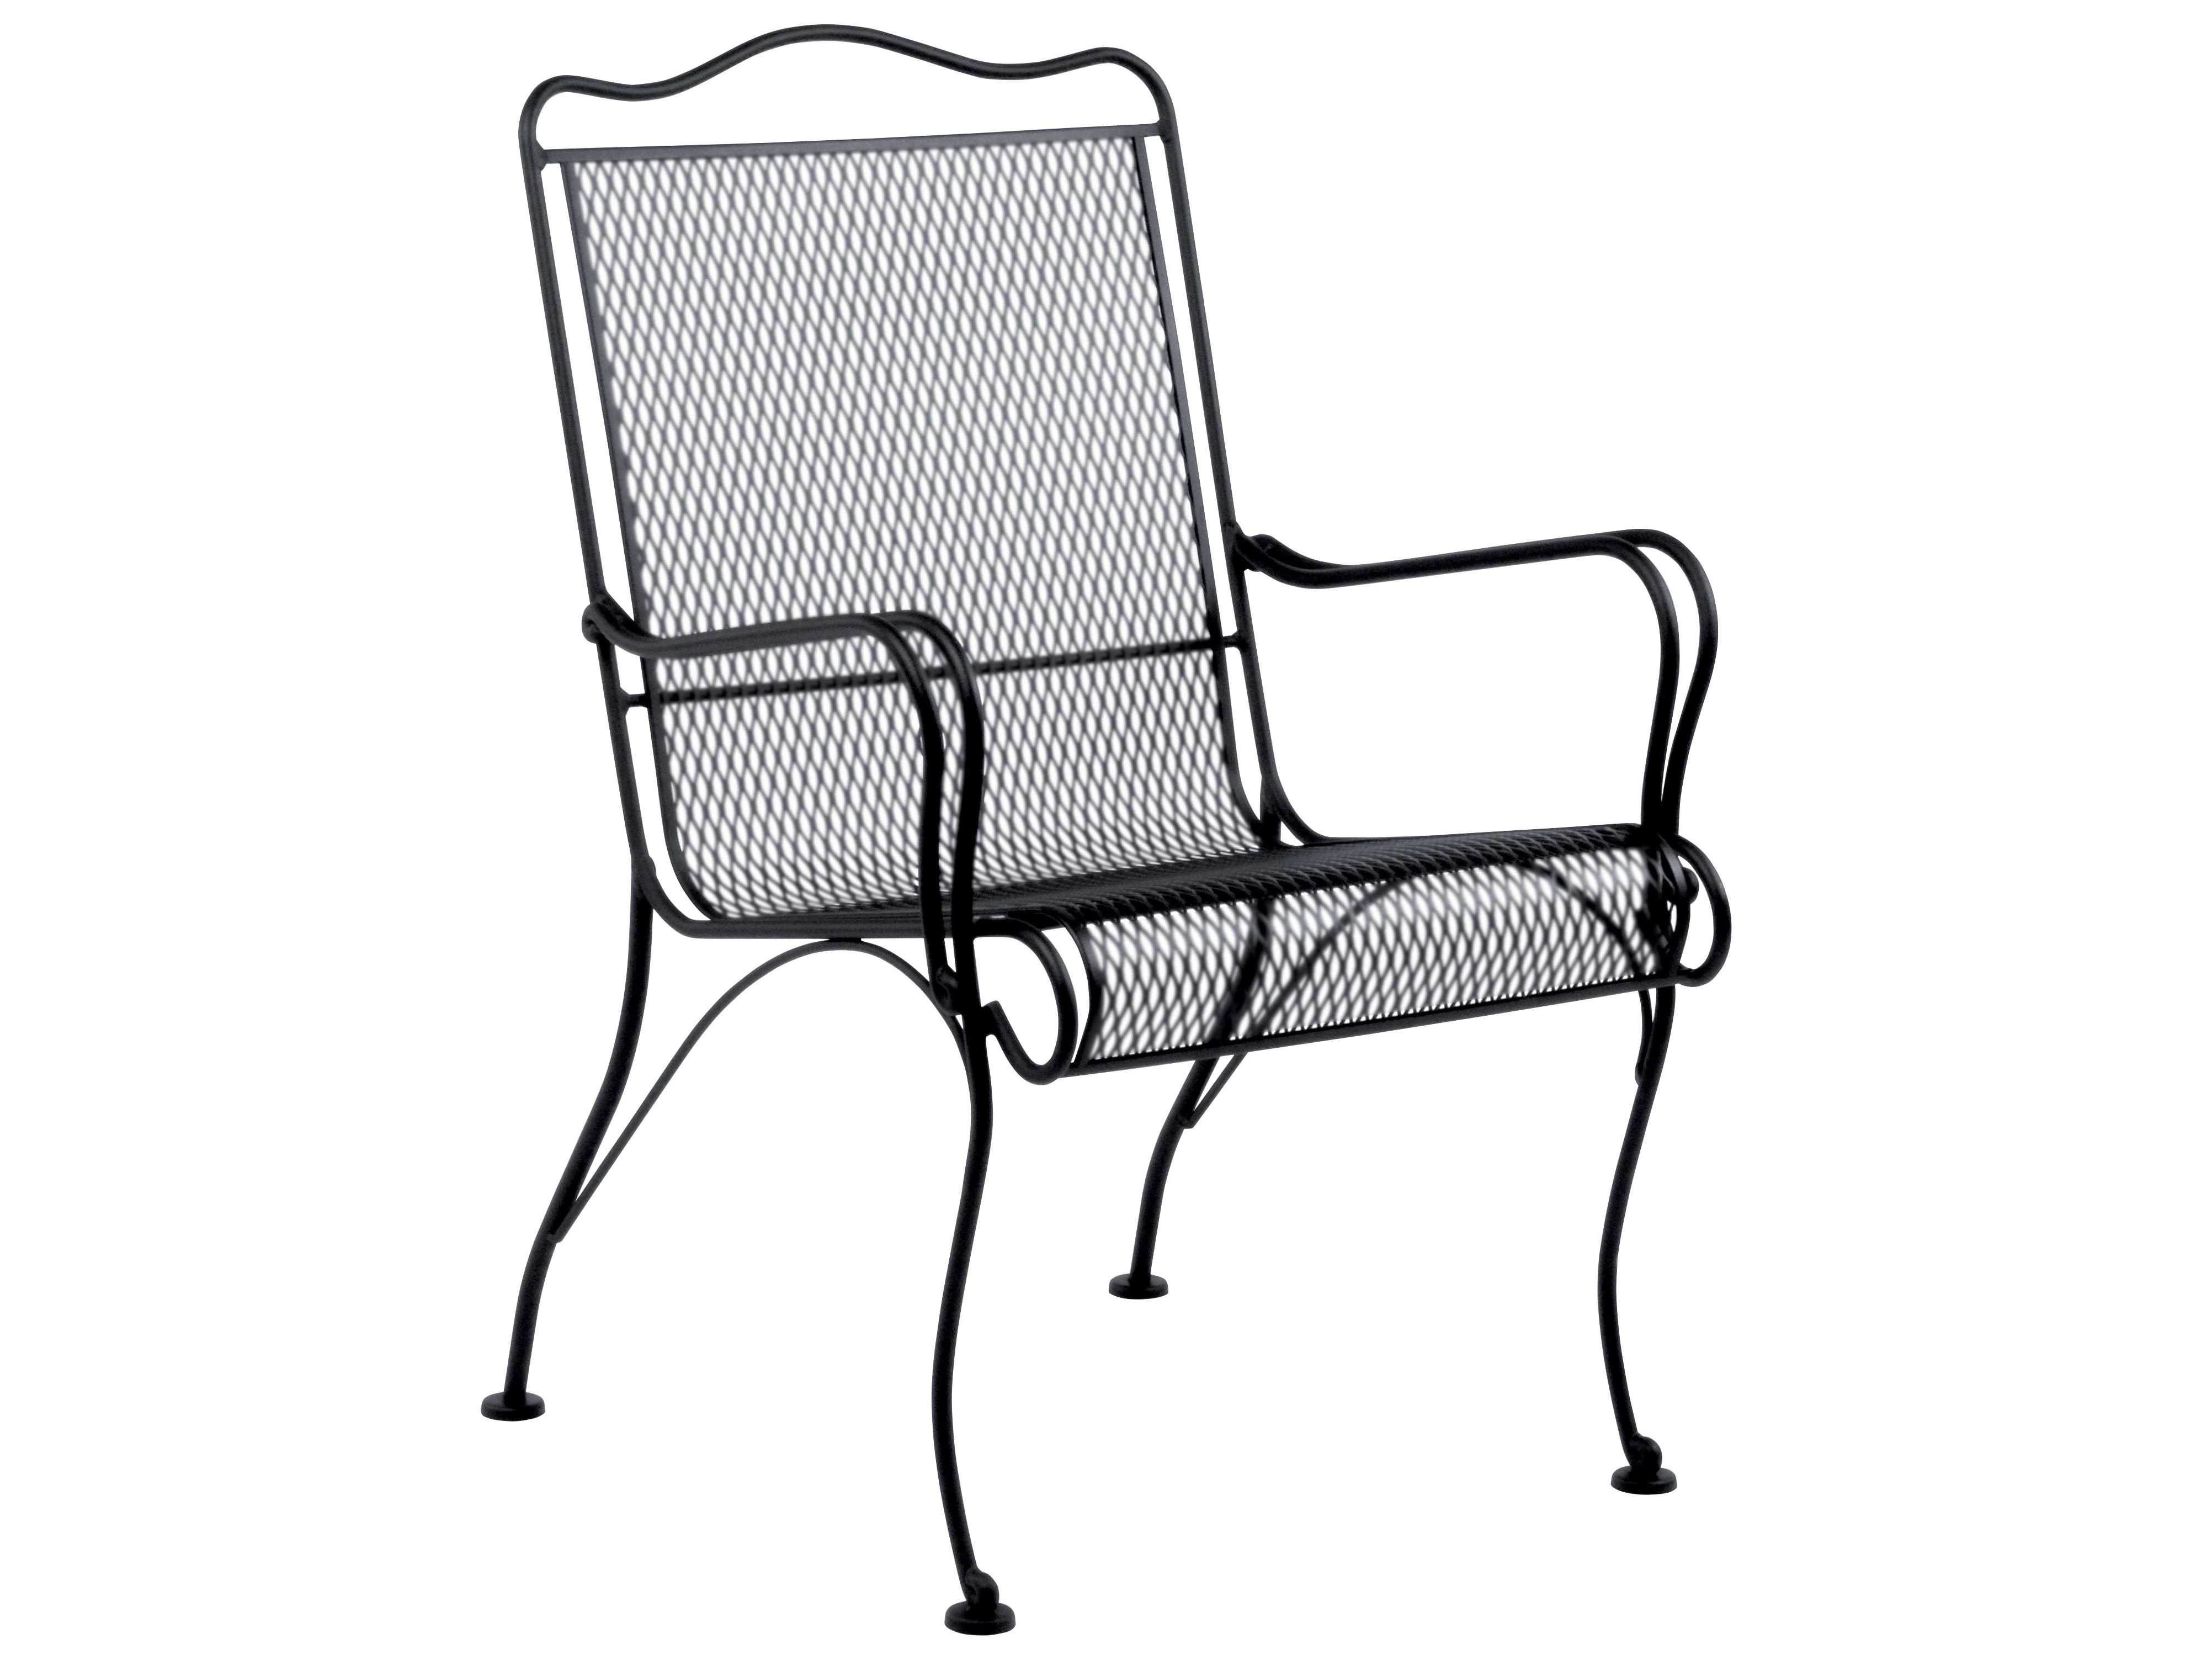 woodard tucson wrought iron high back lounge chair 1g0006